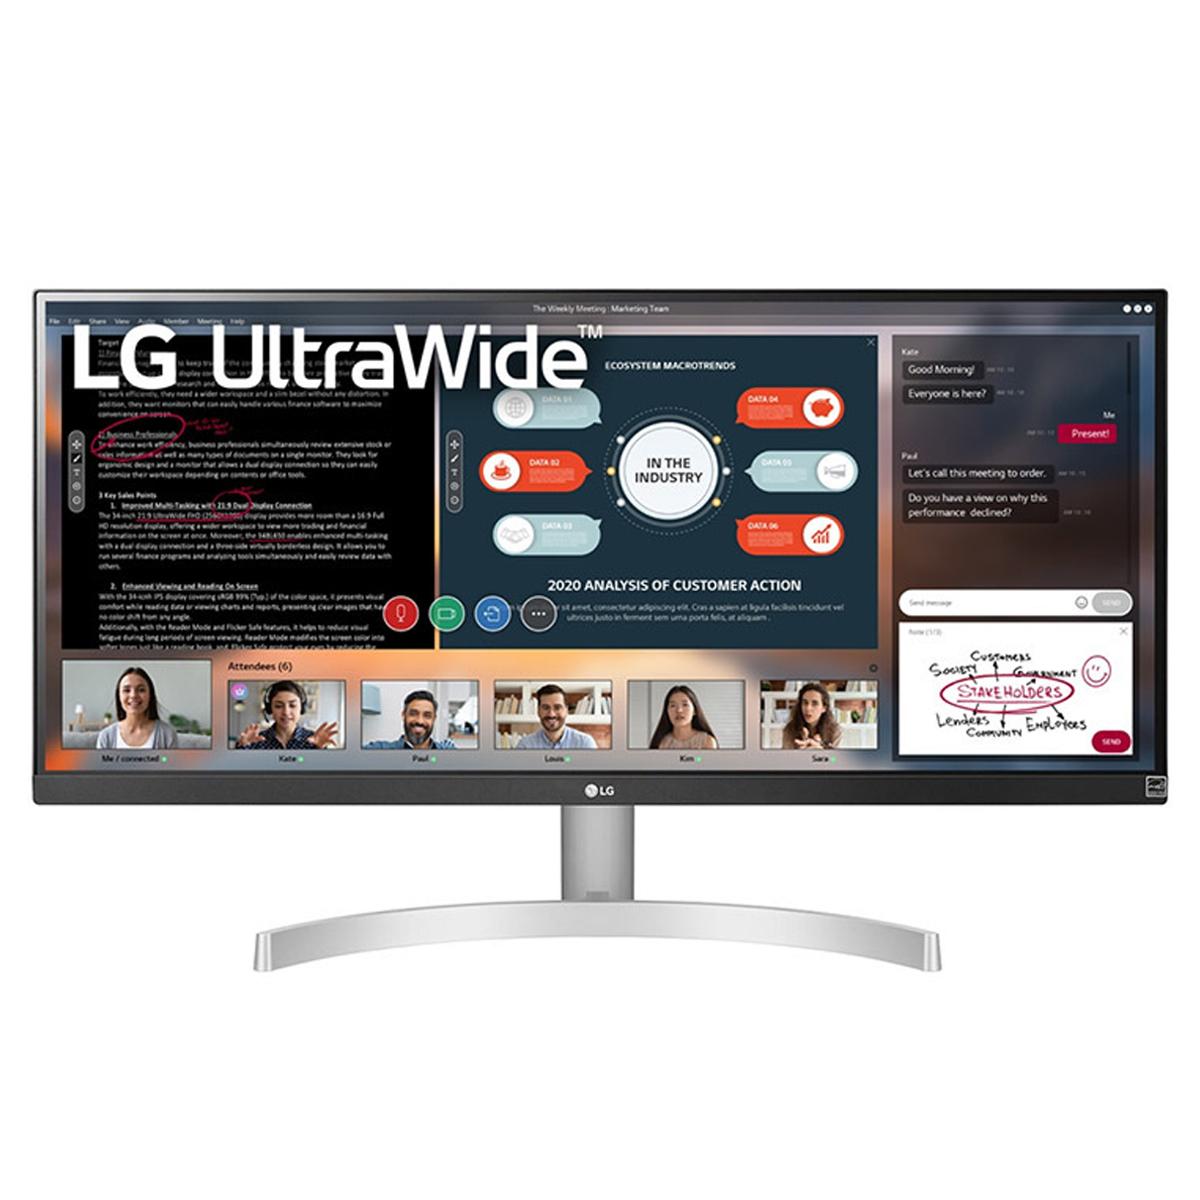 "LG 29WN600-W pantalla para PC 73,7 cm (29"") 2560 x 1080 Pixeles UltraWide Full HD LED Plata"